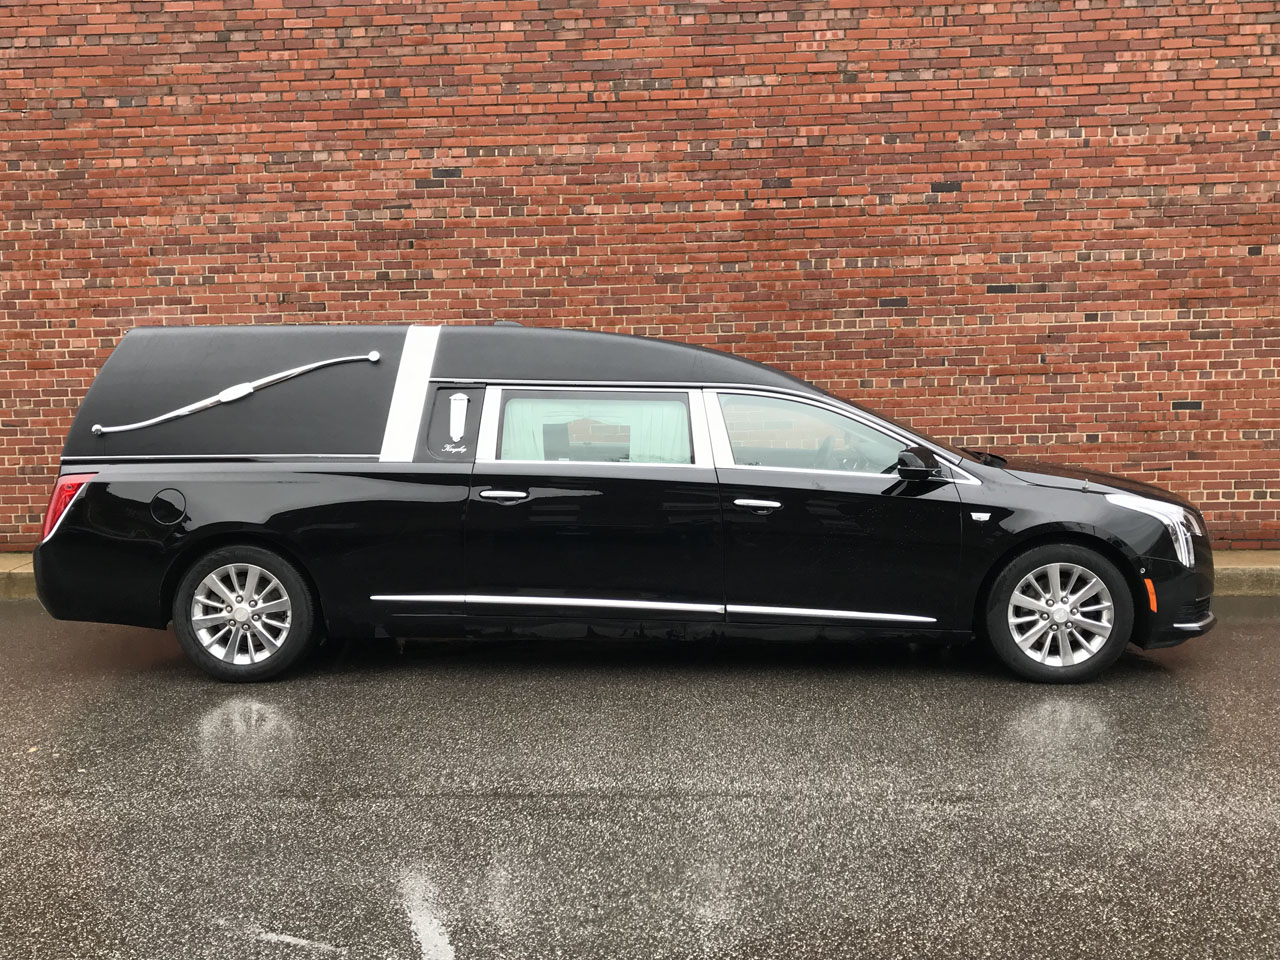 Kia Of Carson >> 2018 Cadillac Hearse - New Car Release Date and Review 2018   Amanda Felicia